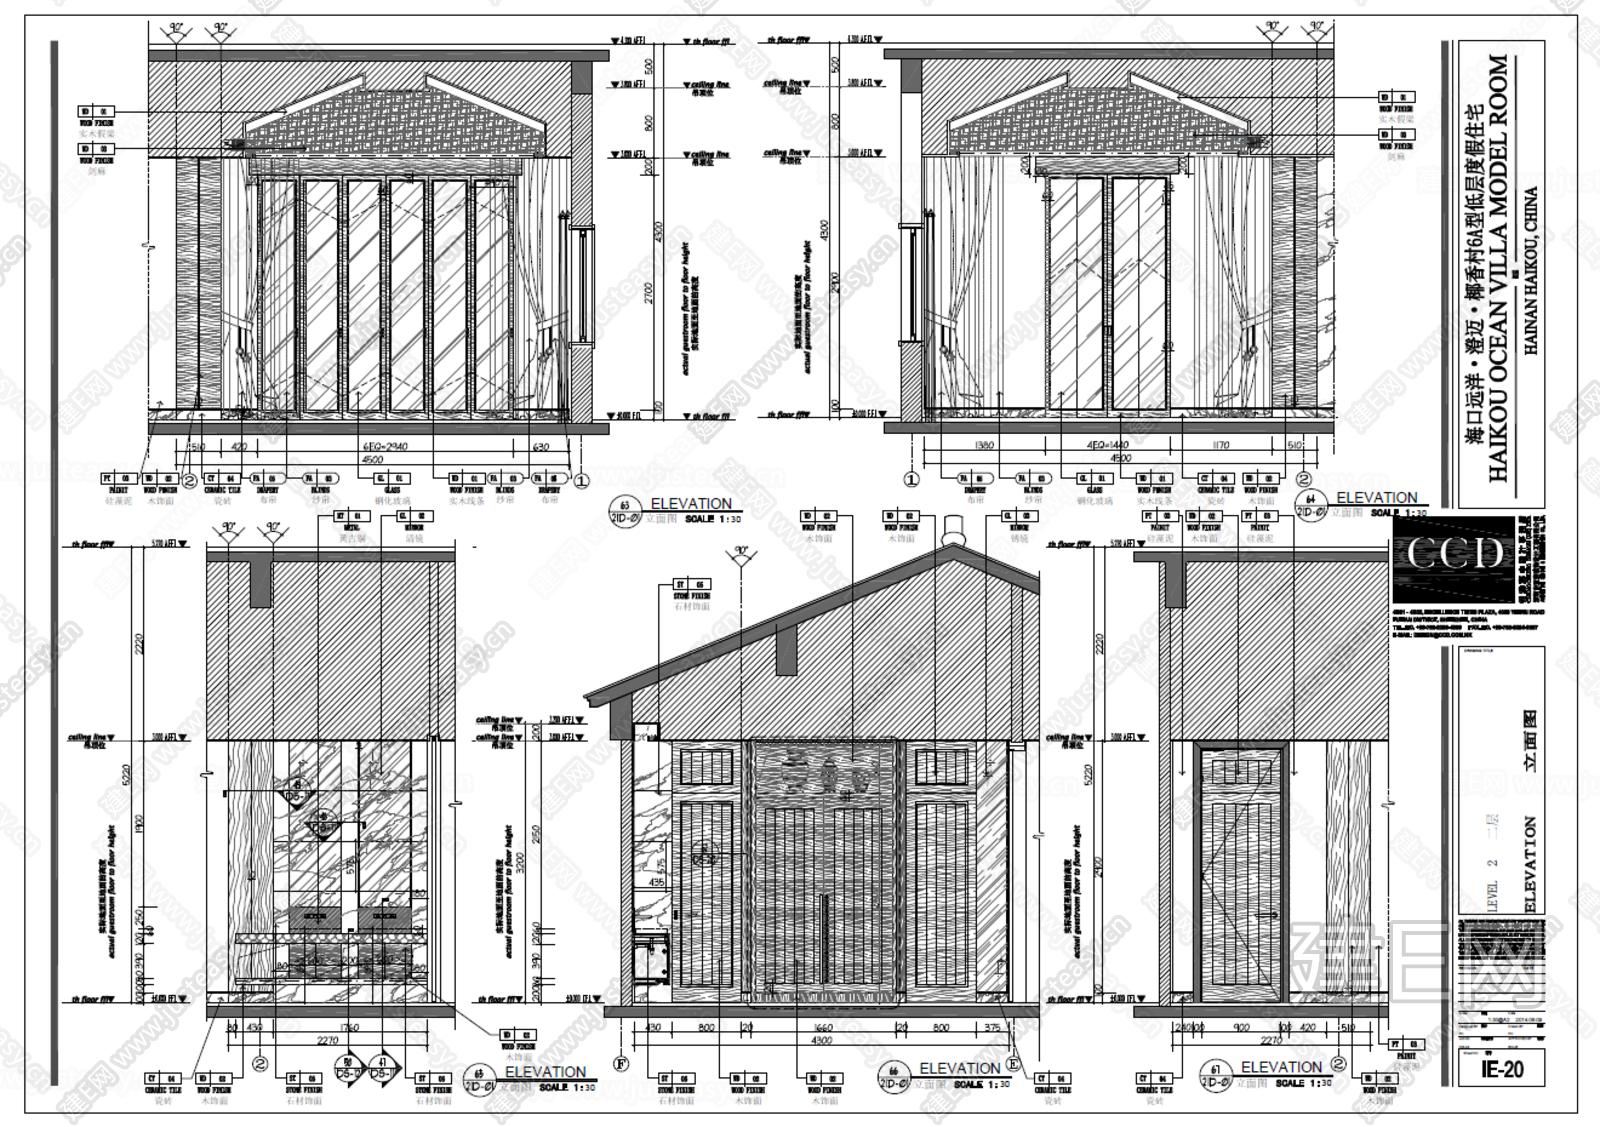 CCD海口远洋别墅|效果图+CAD施工图+物料表+设计方案PPT